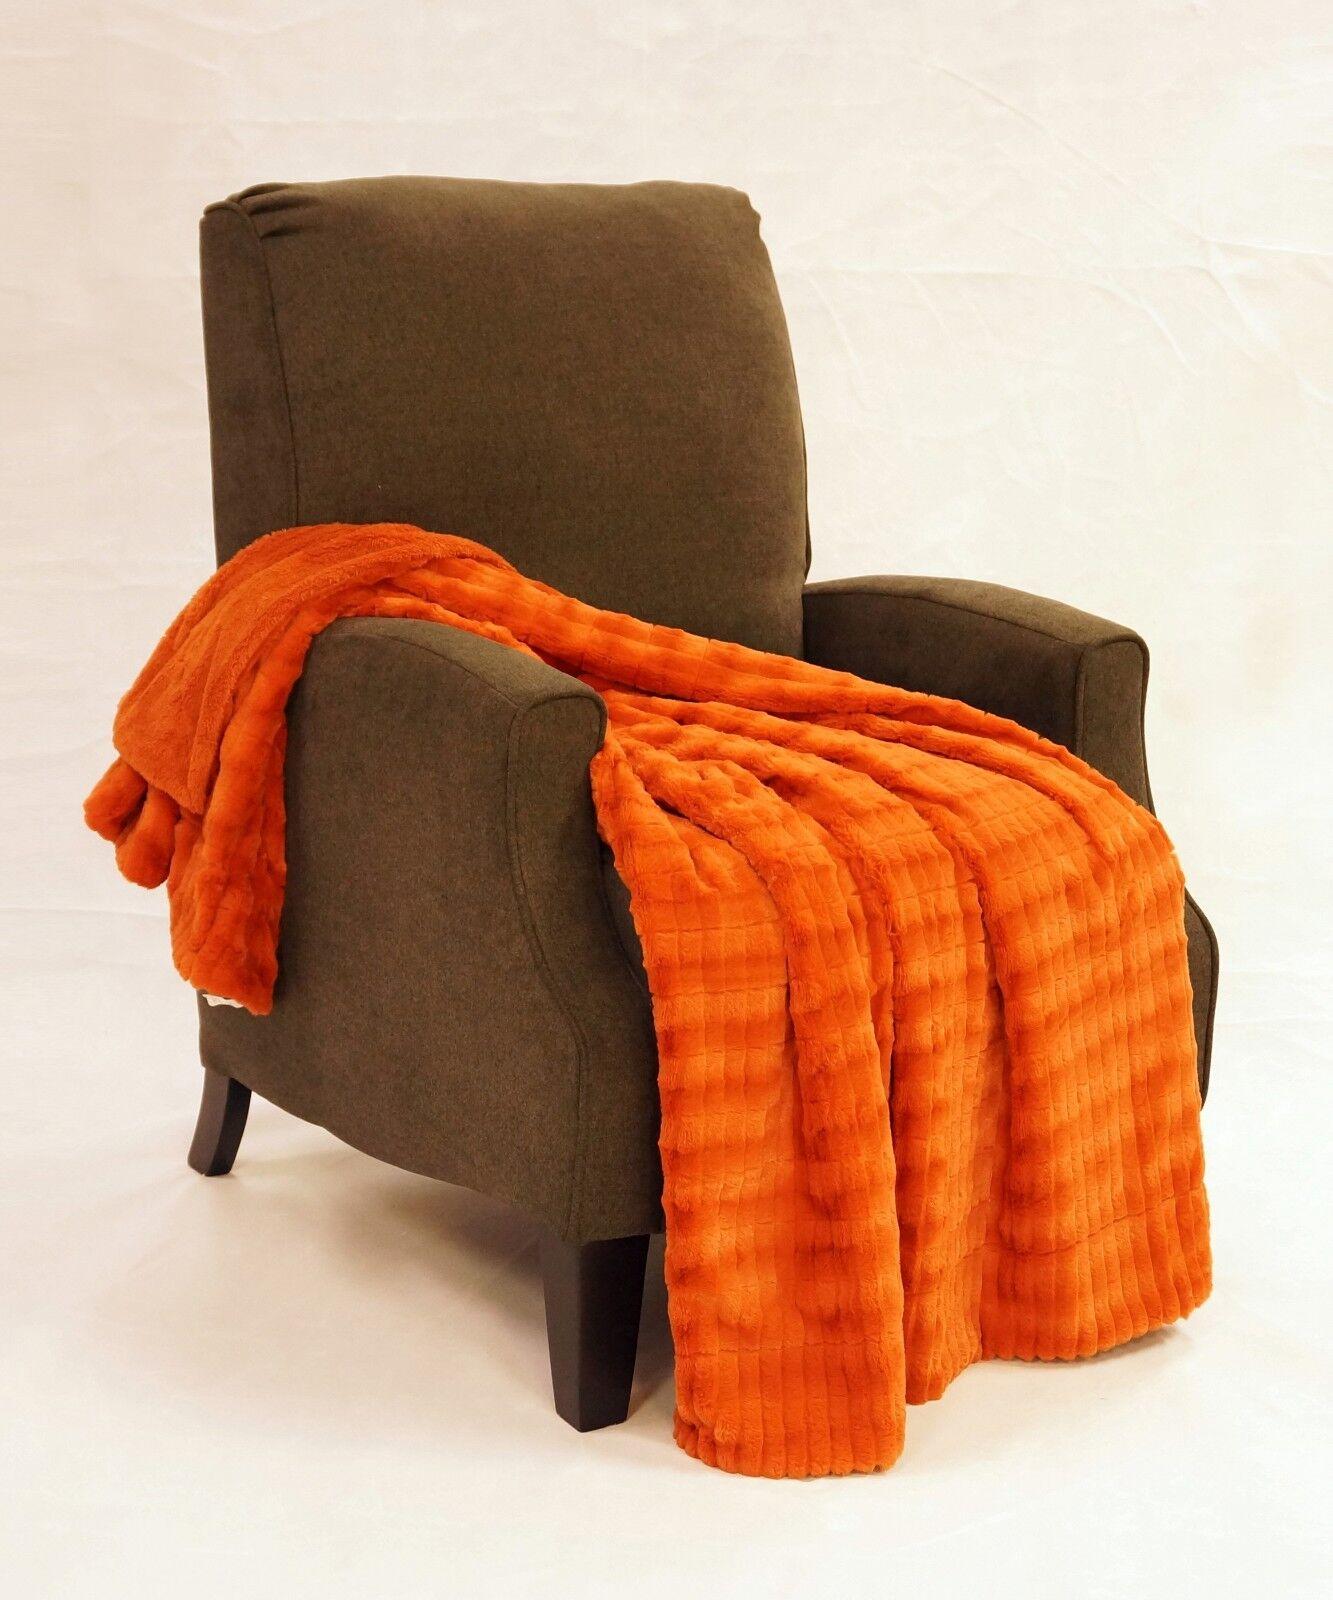 Boon Garret Faux Fur Throw Blanket 20in X 20in Burnt Orange   eBay